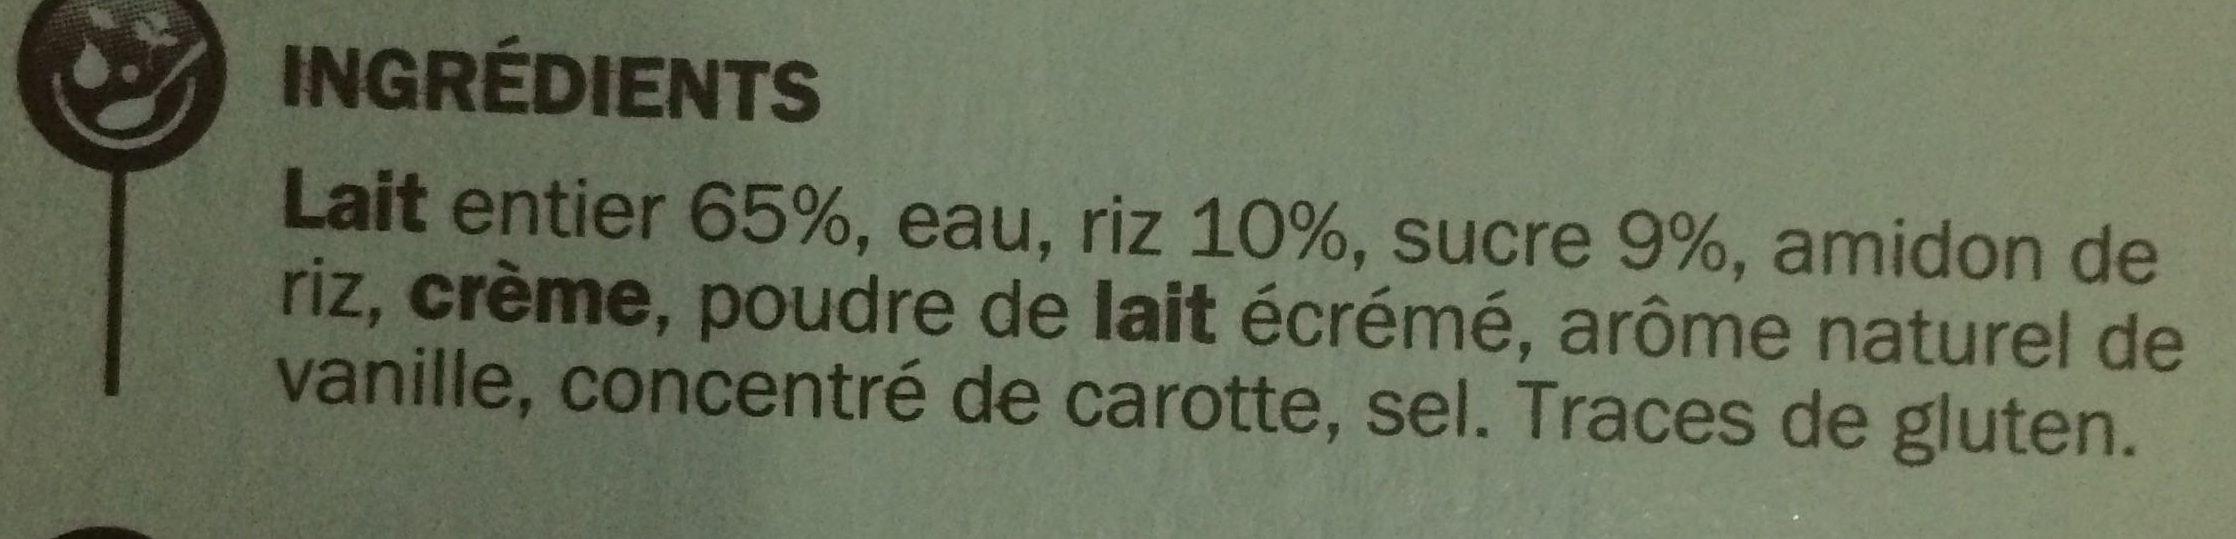 Riz au lait saveur vanille - Ingredients - fr